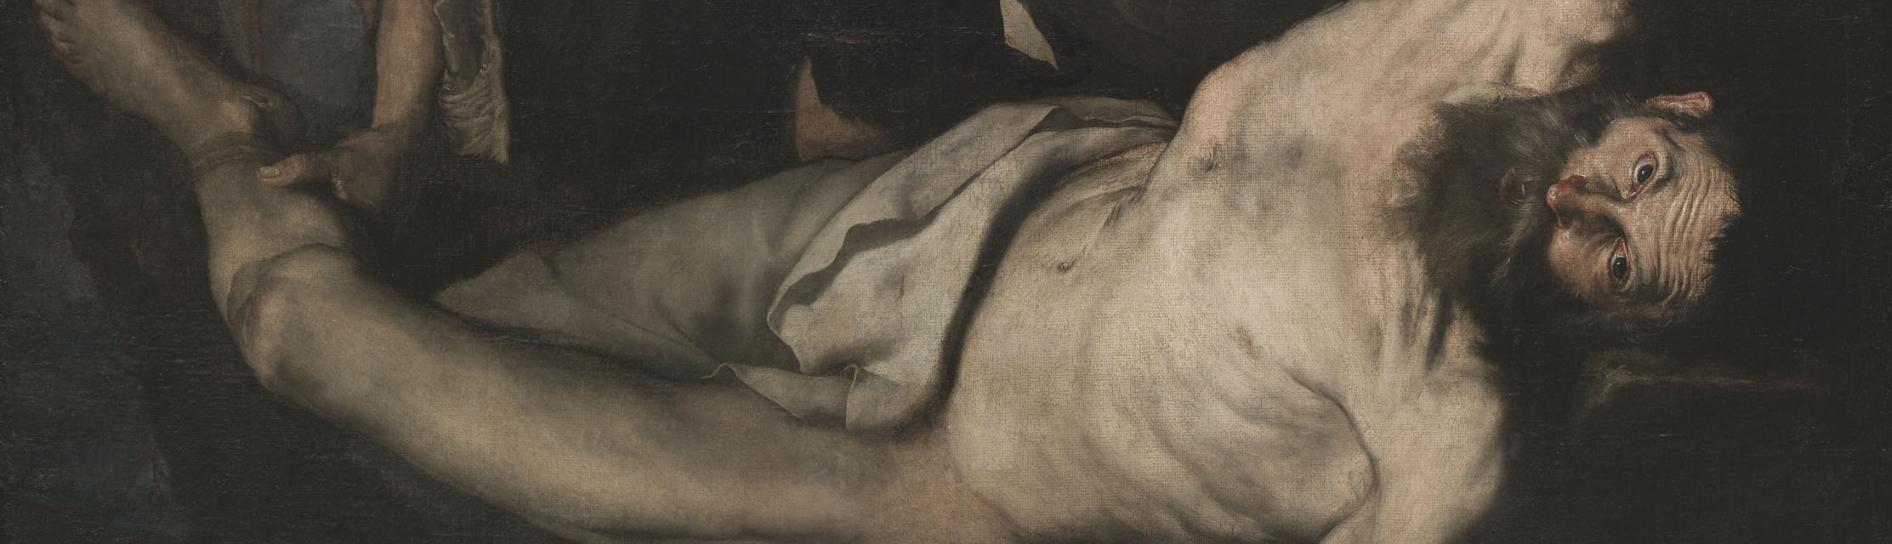 Josep de Ribera o Jusepe de Ribera, Martiri de sant Bartomeu, 1644